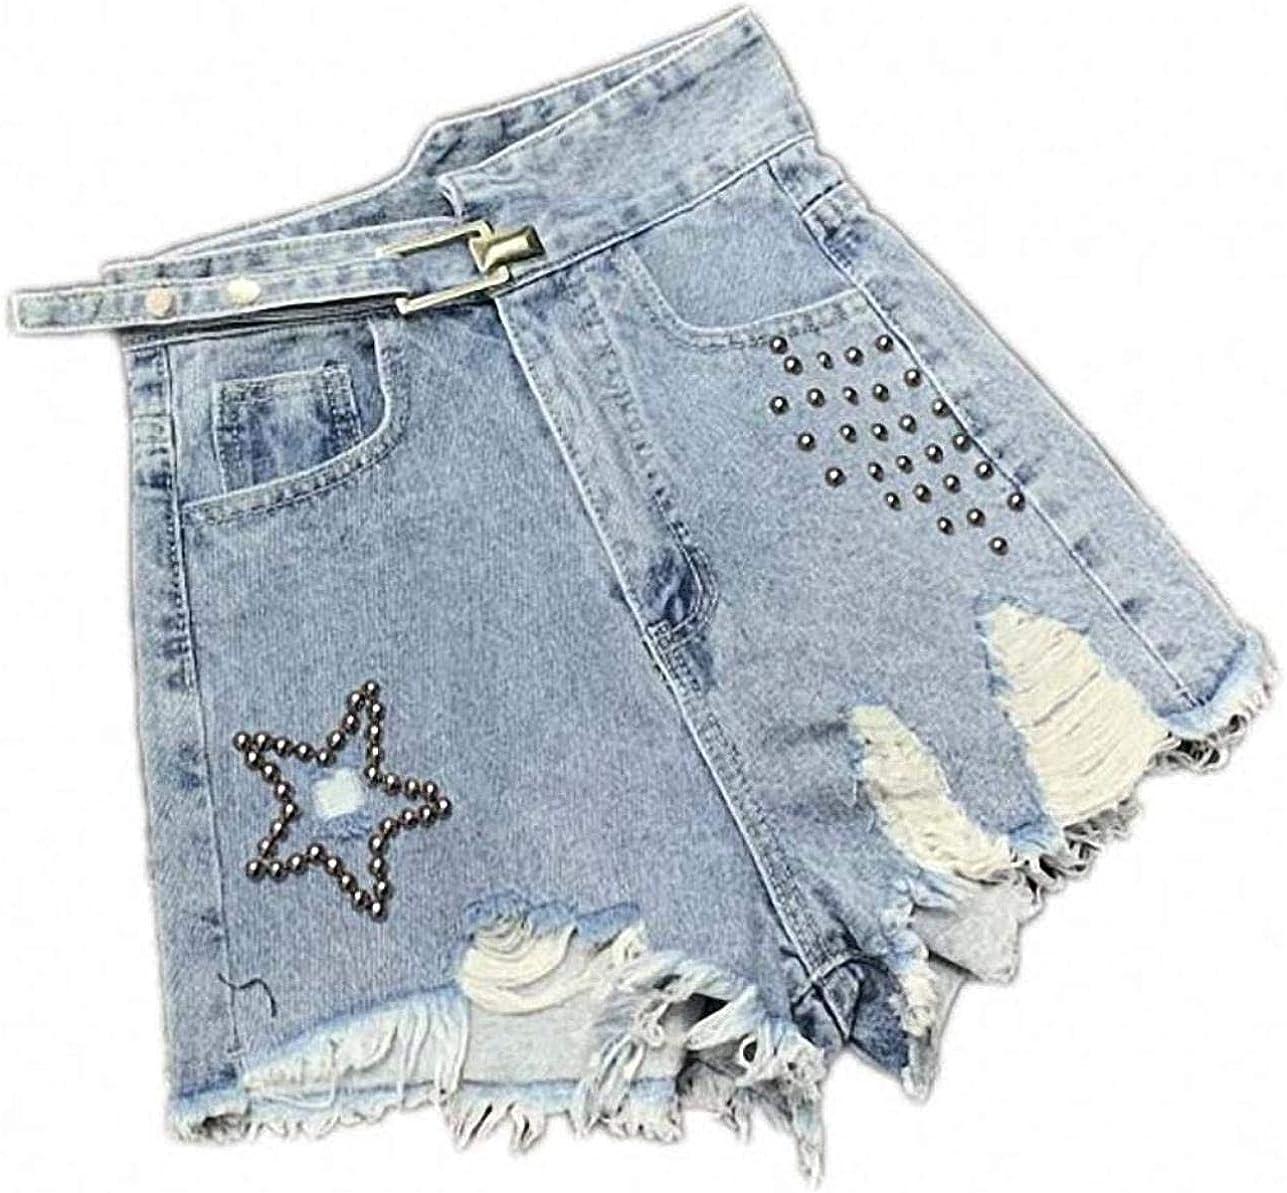 Rsqsjgkert Heavy Industry Beaded Hole Denim Shorts Women Black Wide Leg Metal Buckle Irregular High Waist Jeans Shorts